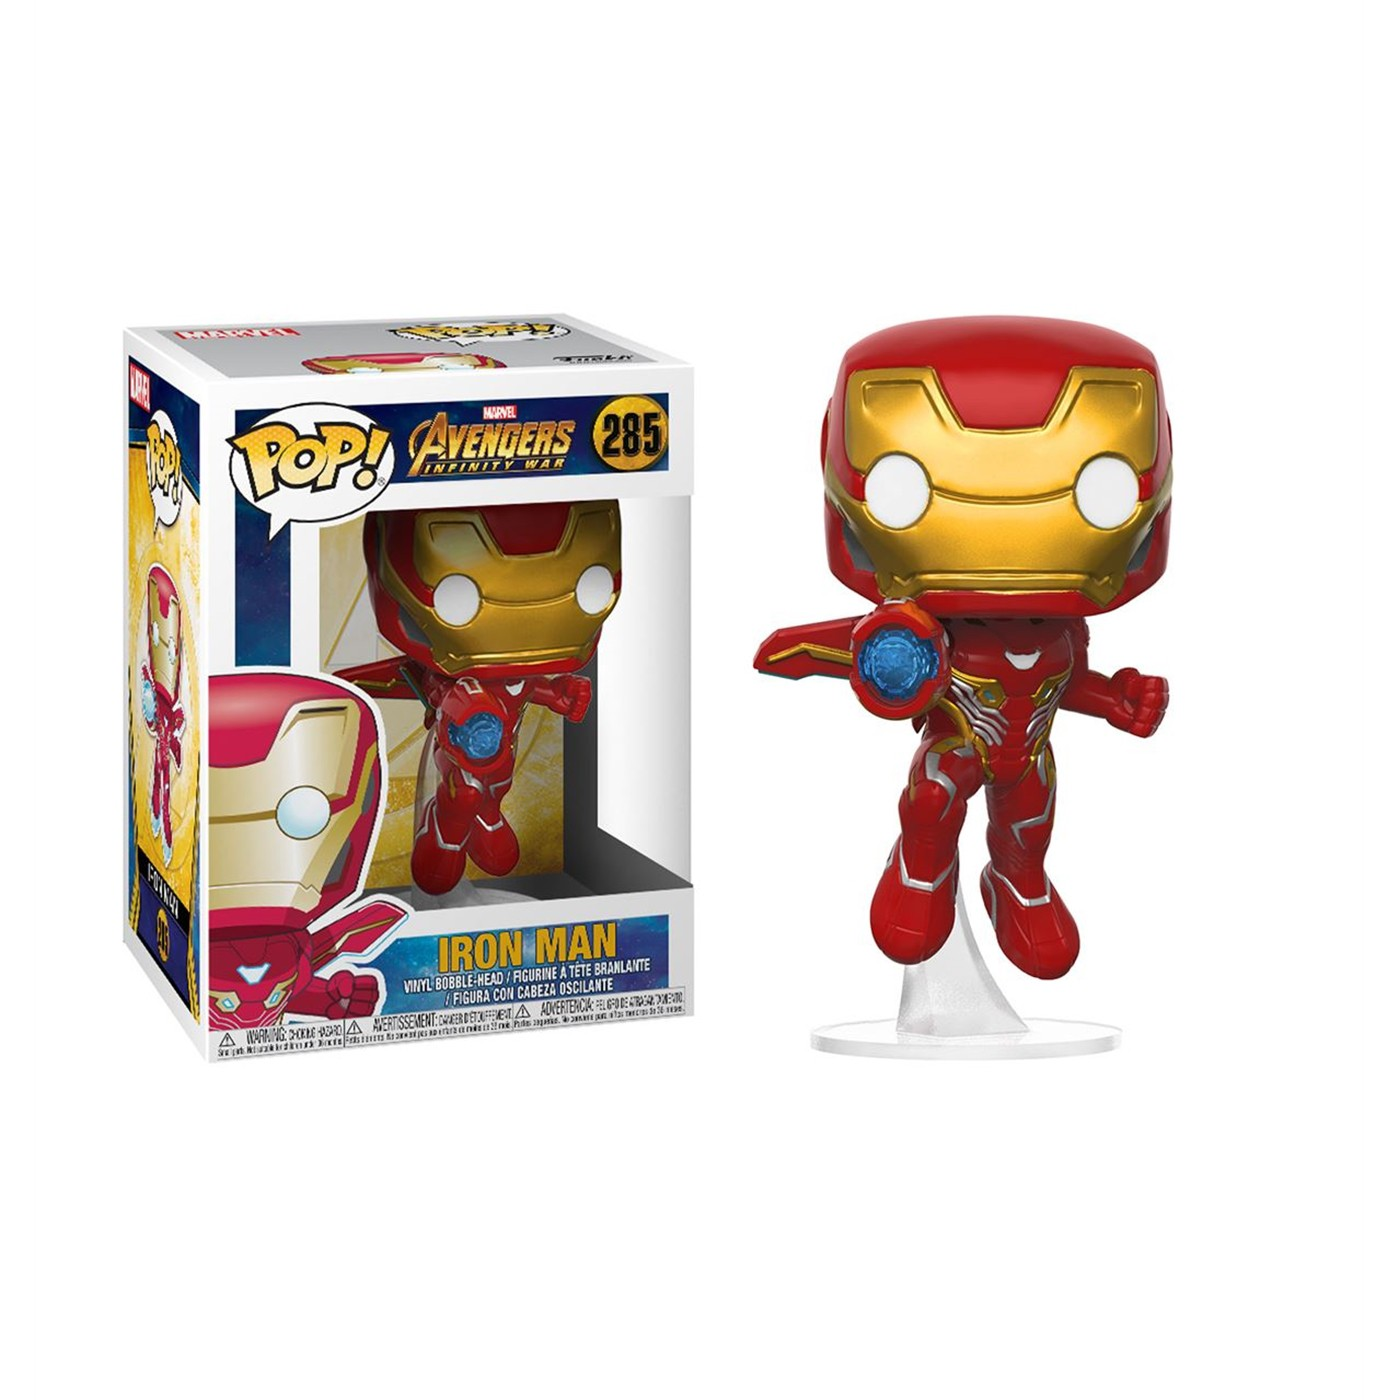 Avengers Infinity War Iron Man Funko Pop Bobble Head